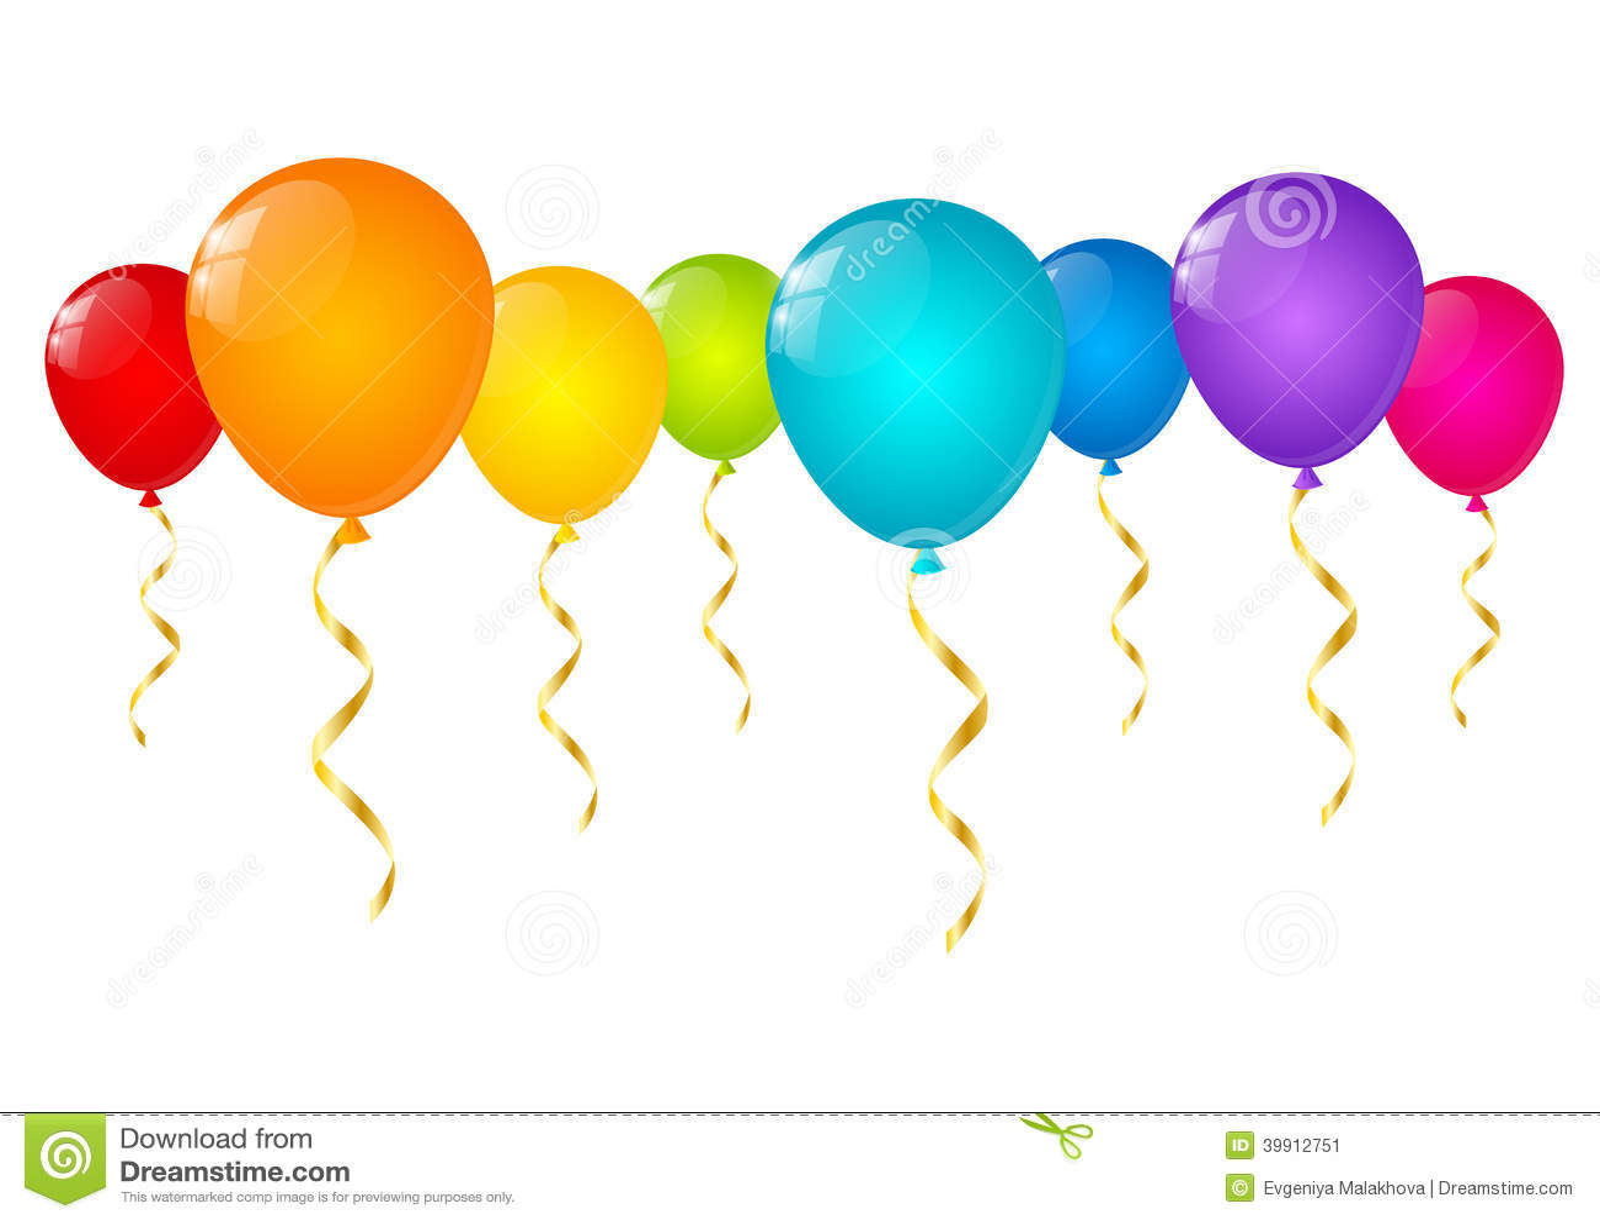 Rainbow Balloons Isolated Stock Vector - Image: 39912751